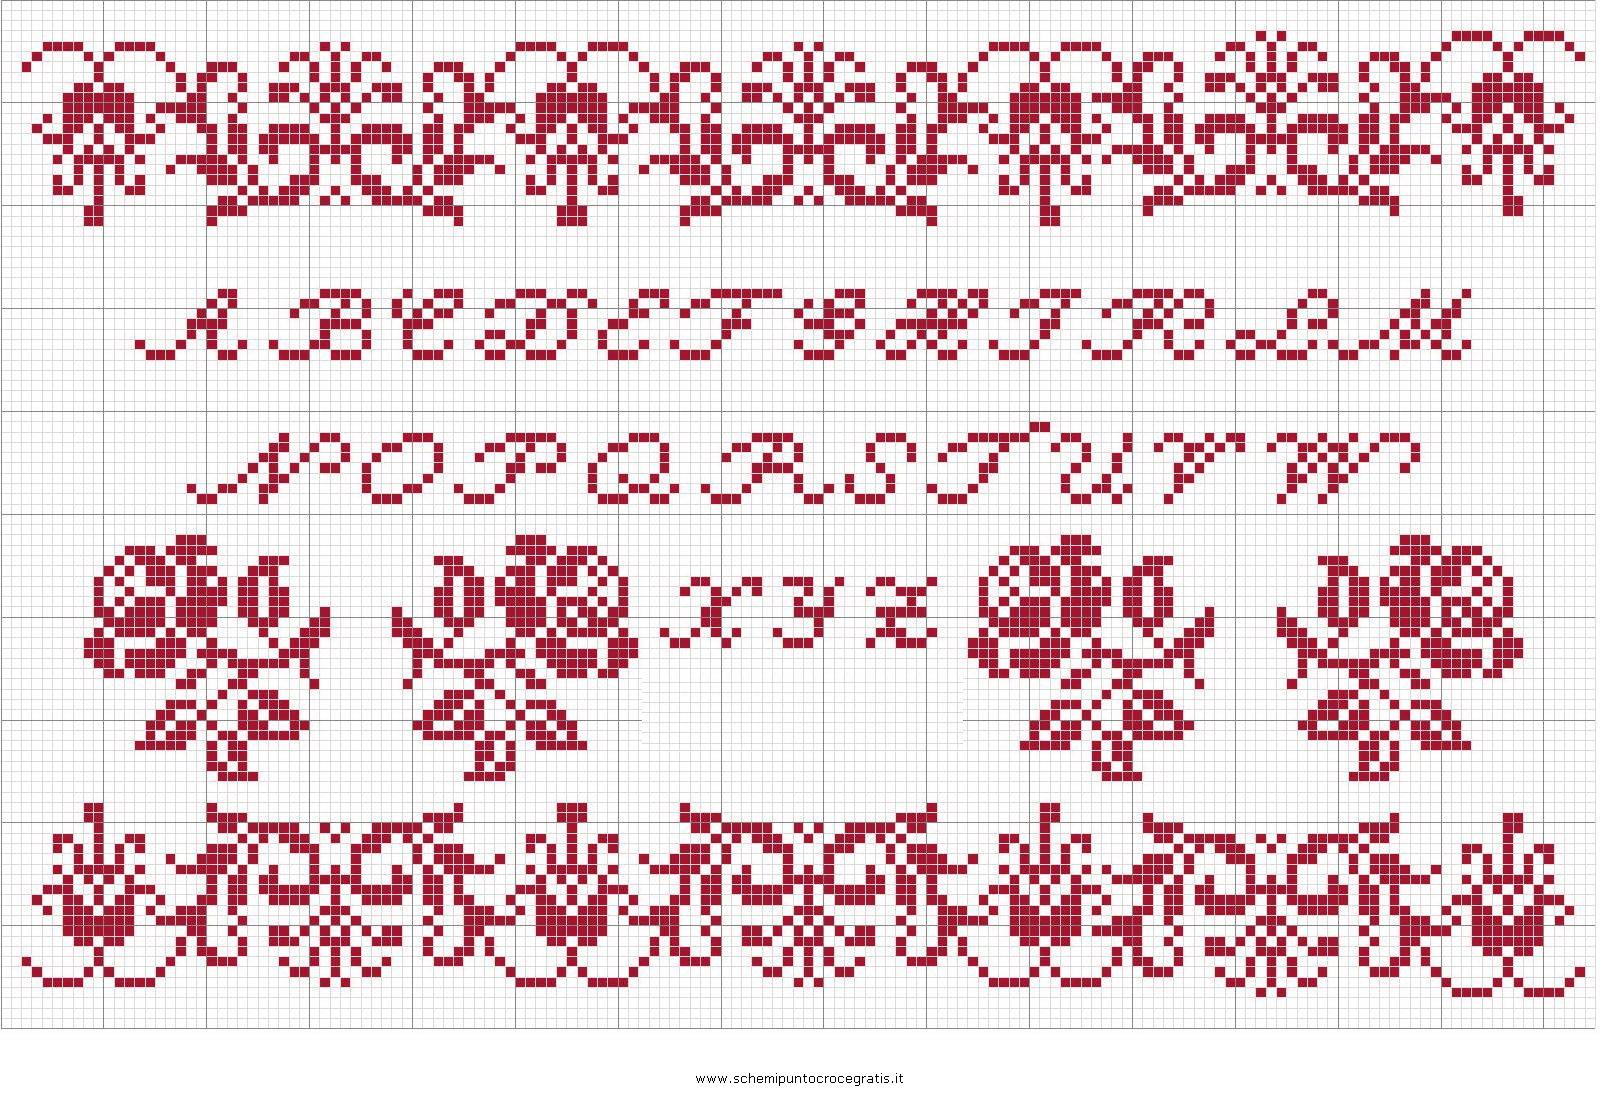 schemi_misti/alfabeti/puntocroce_alfabeto_26.jpg